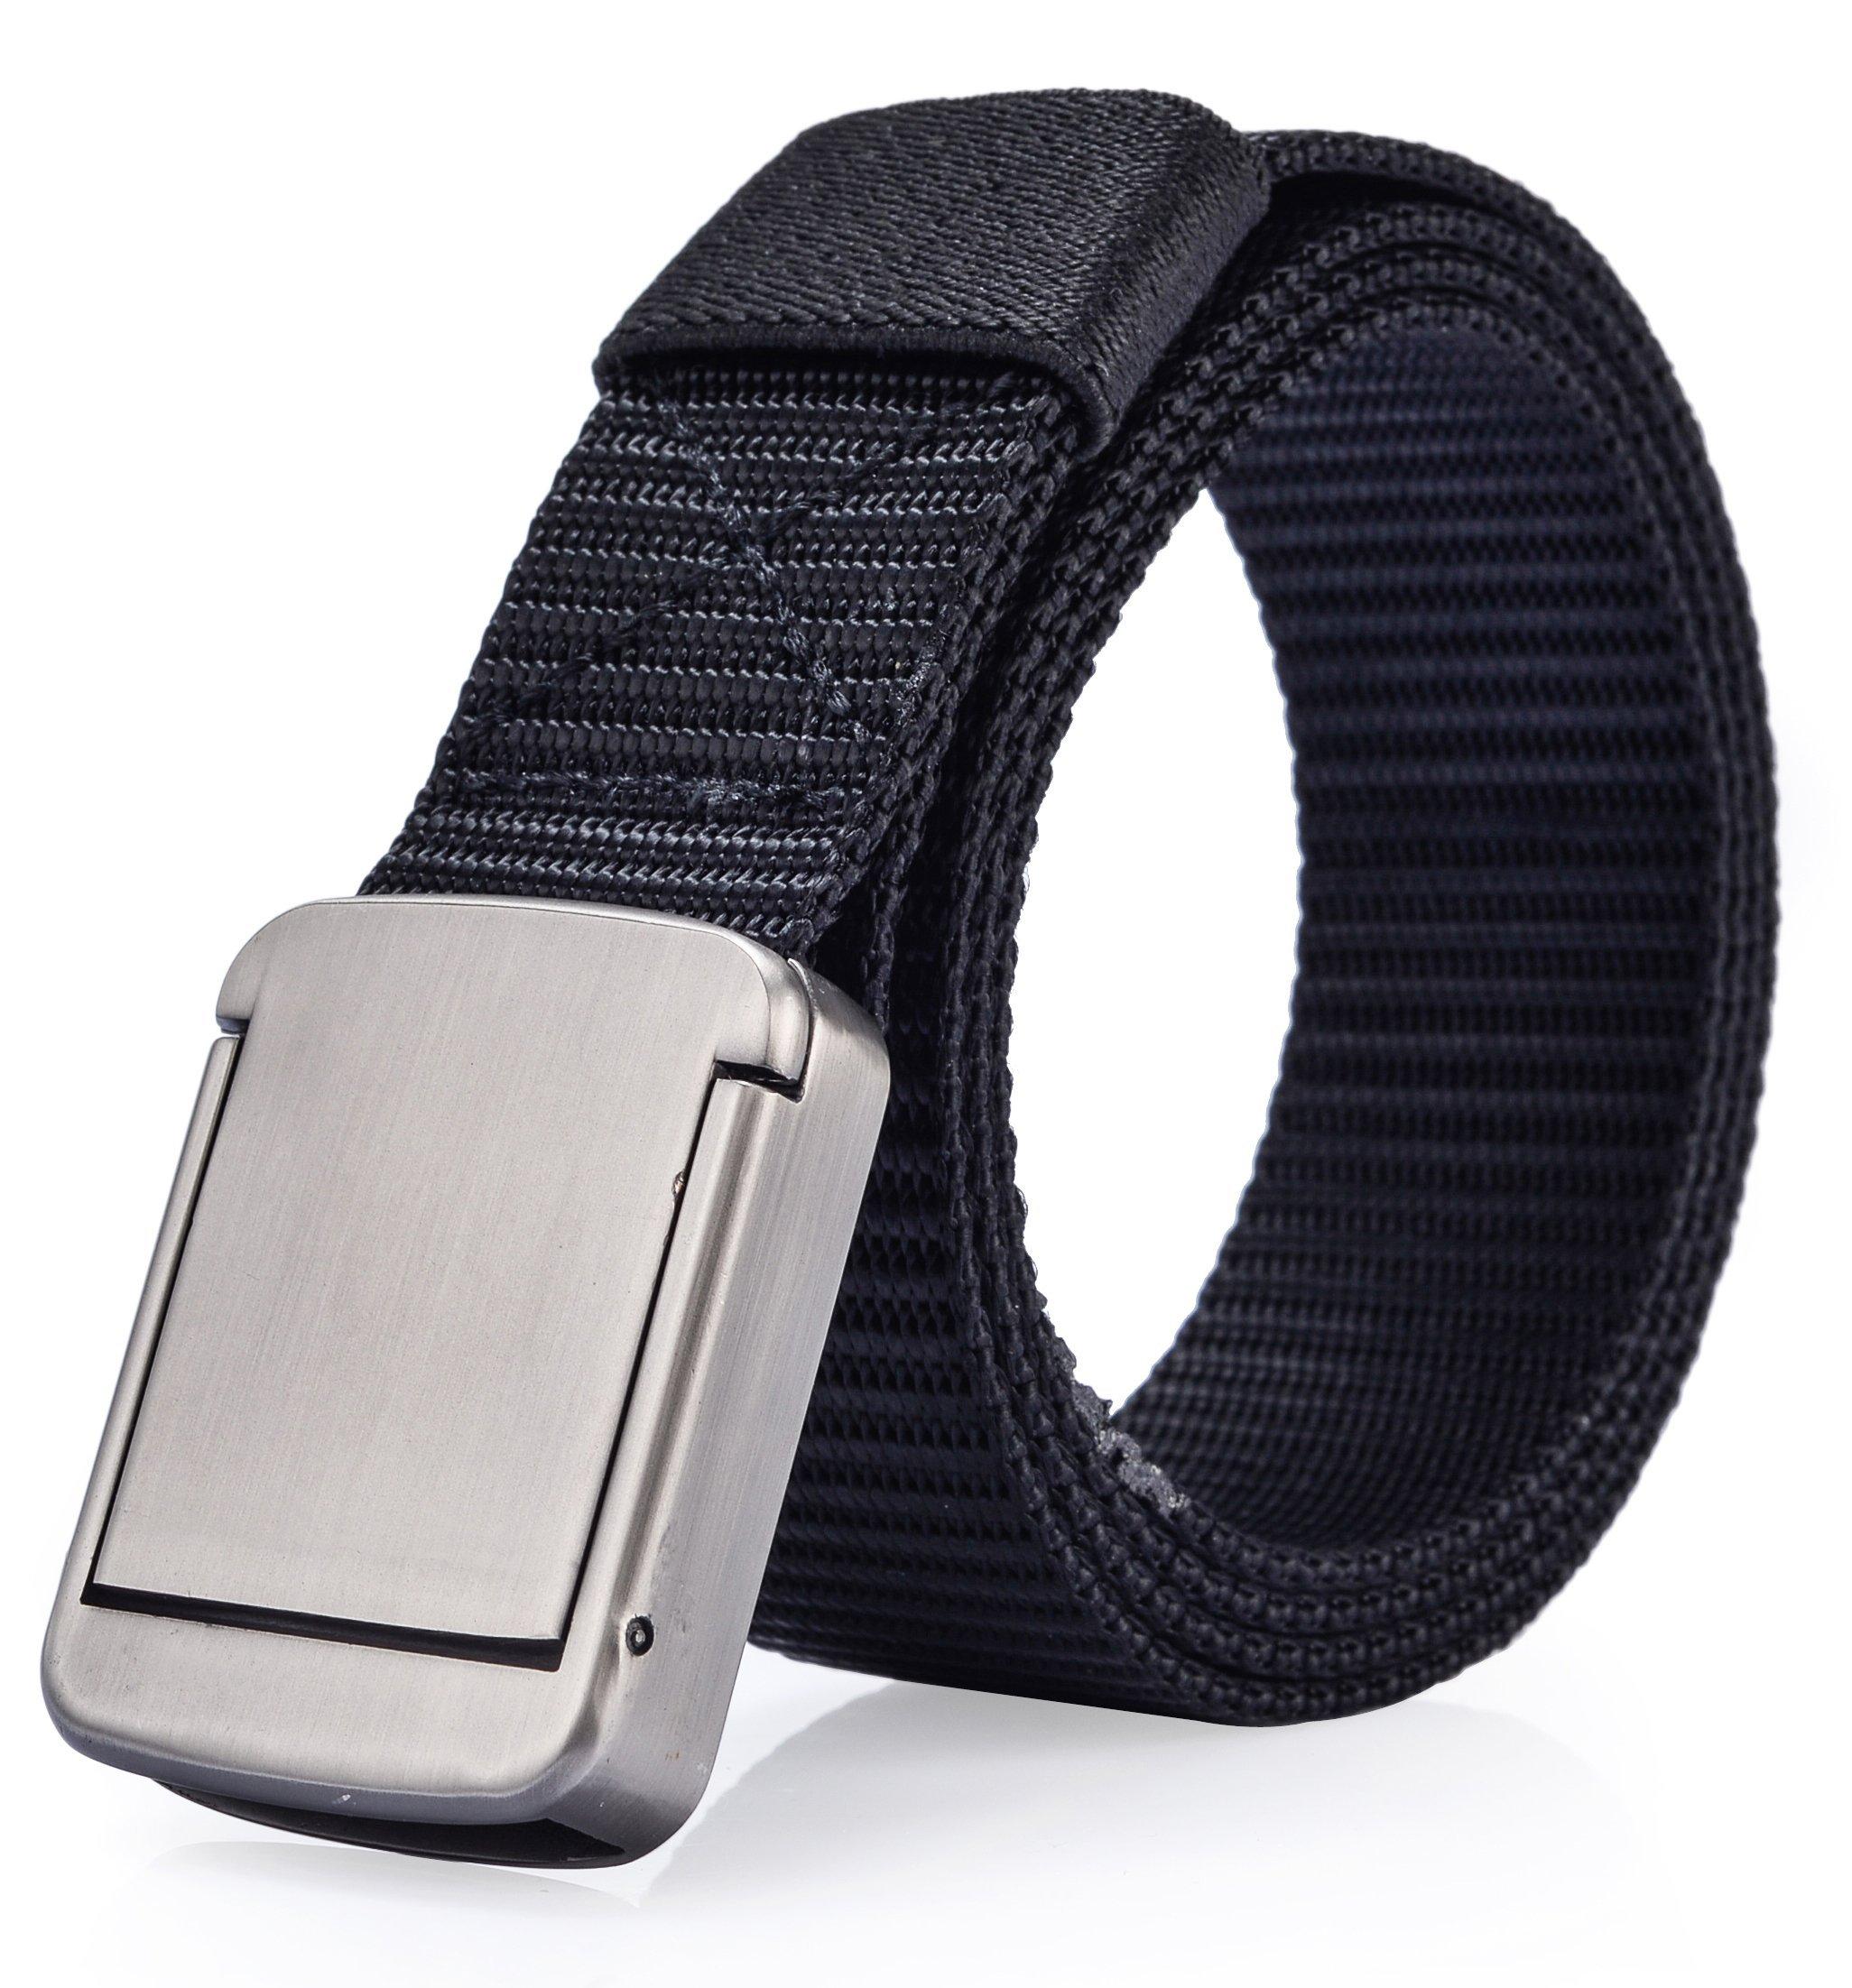 Ayli Men's Business Casual Belt, Nylon Web Belt, Adjustable Length, Metal Buckle, Black, bt6b017bk